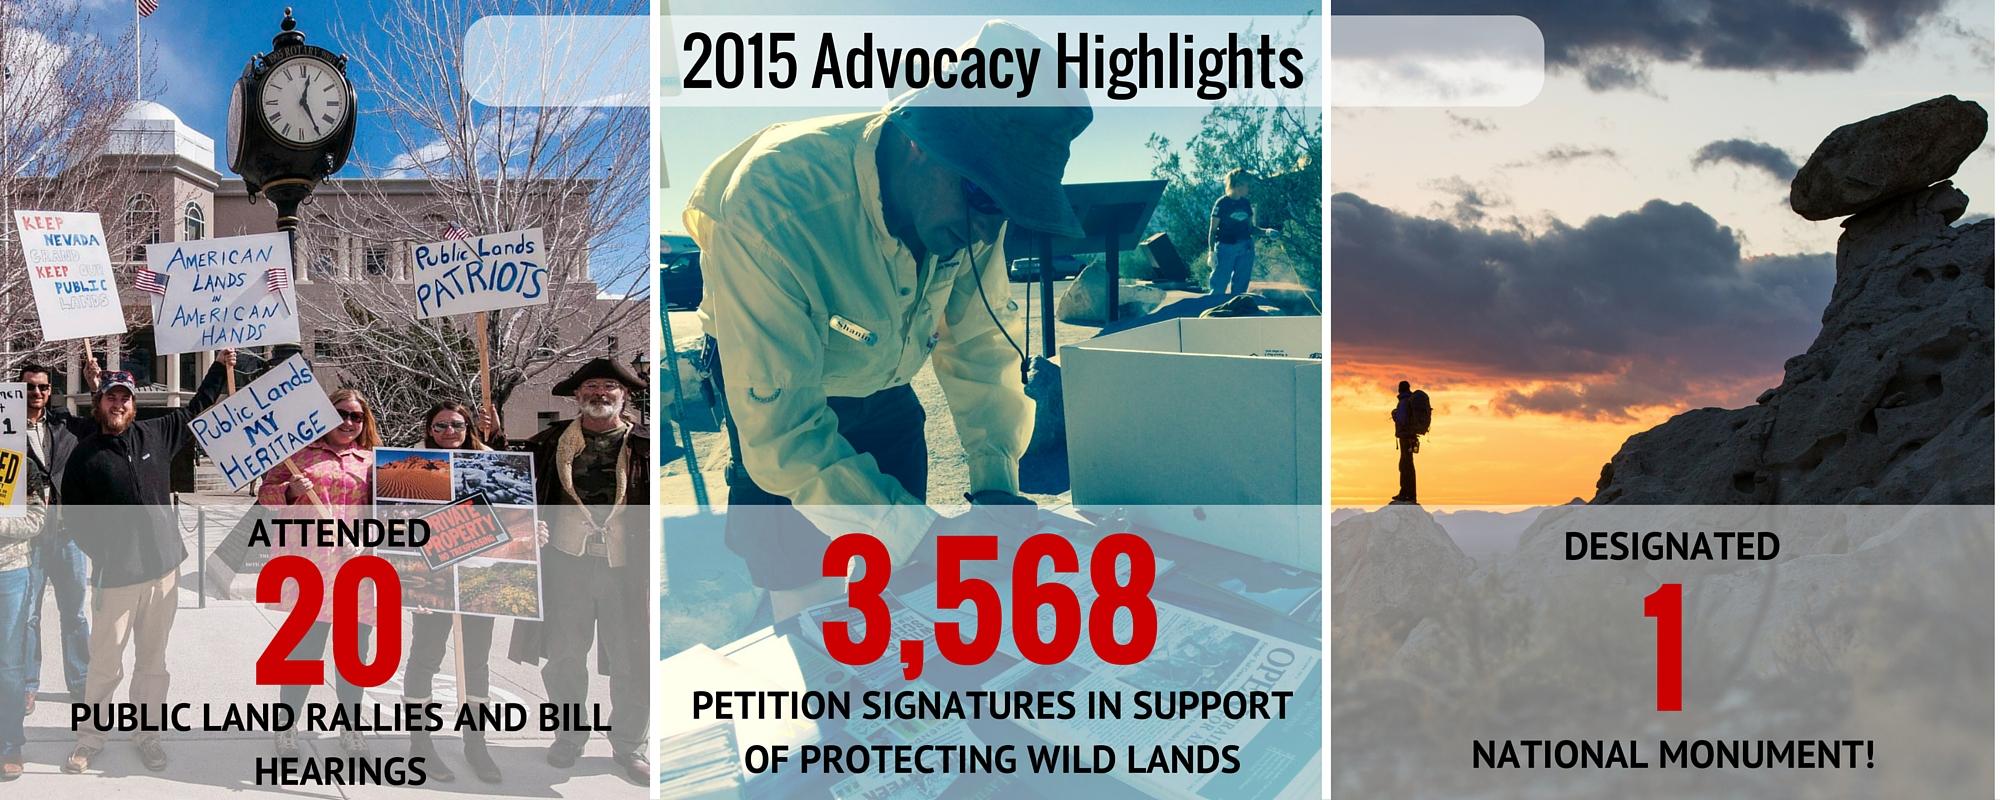 2015_Advocacy_Highlights.jpg